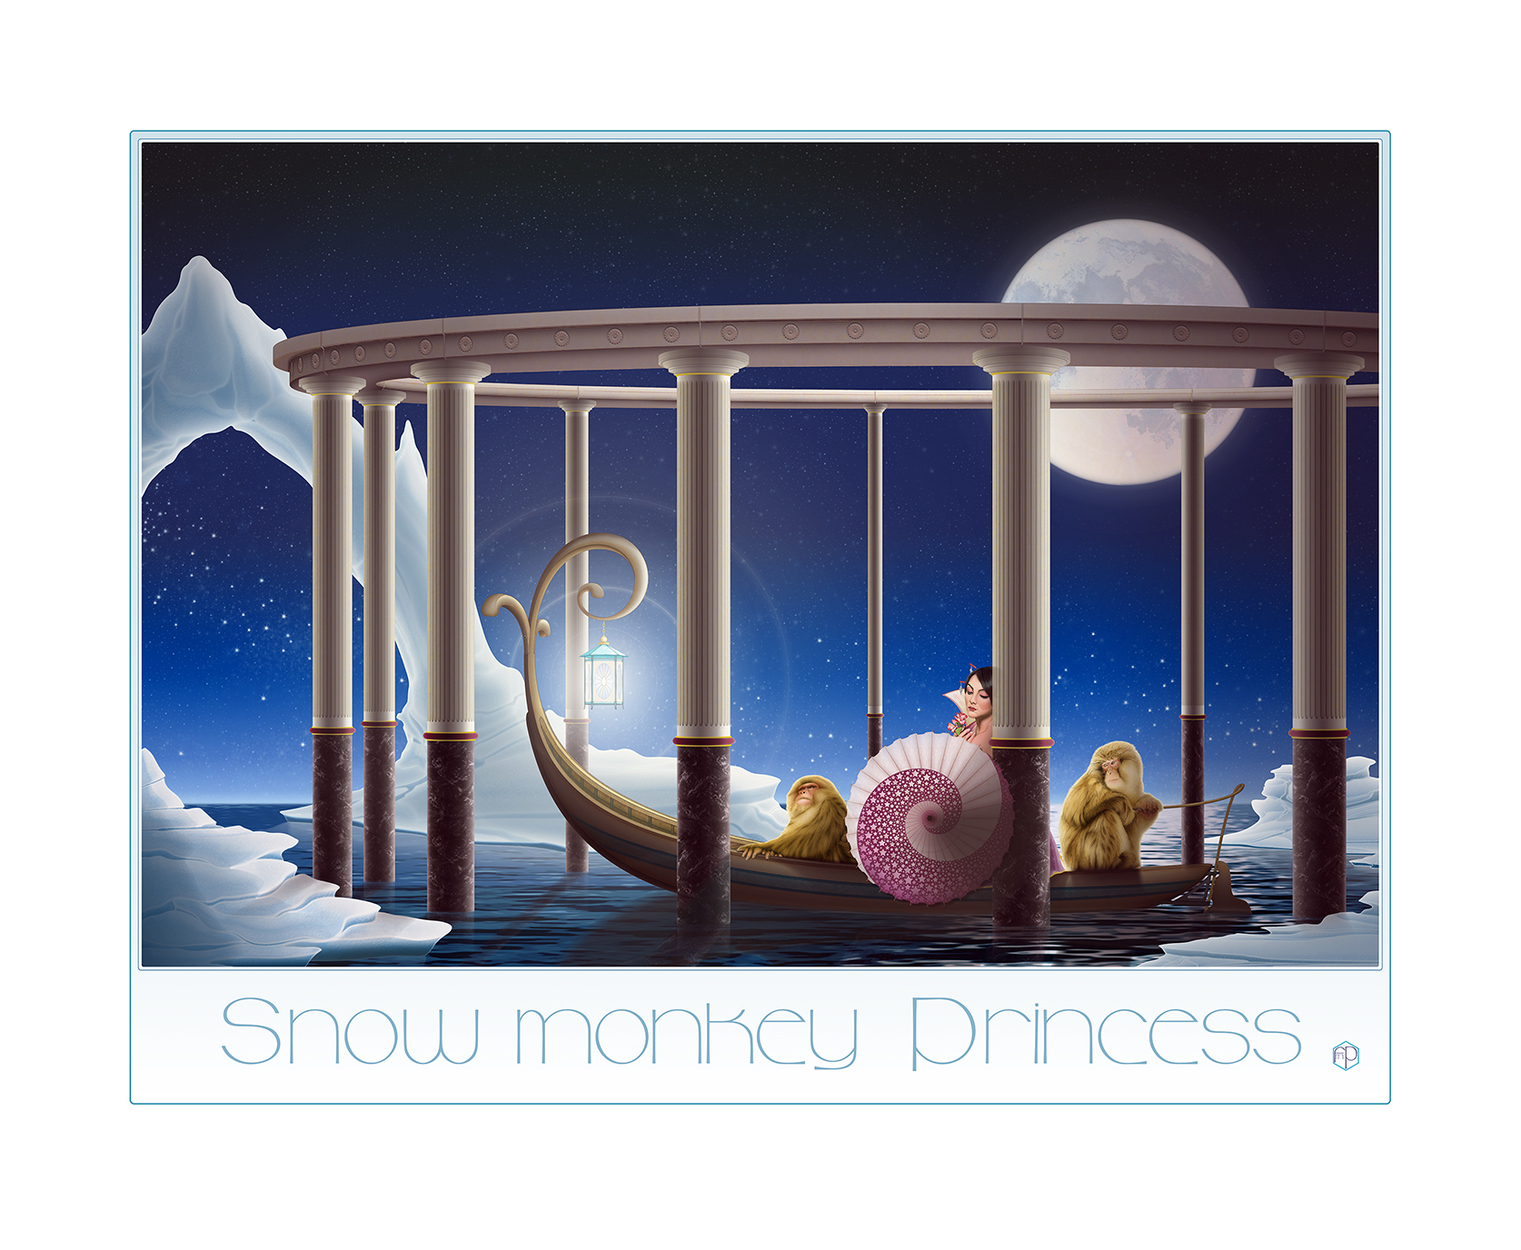 Snow Monkey Princess Artwork by Frederick Powell